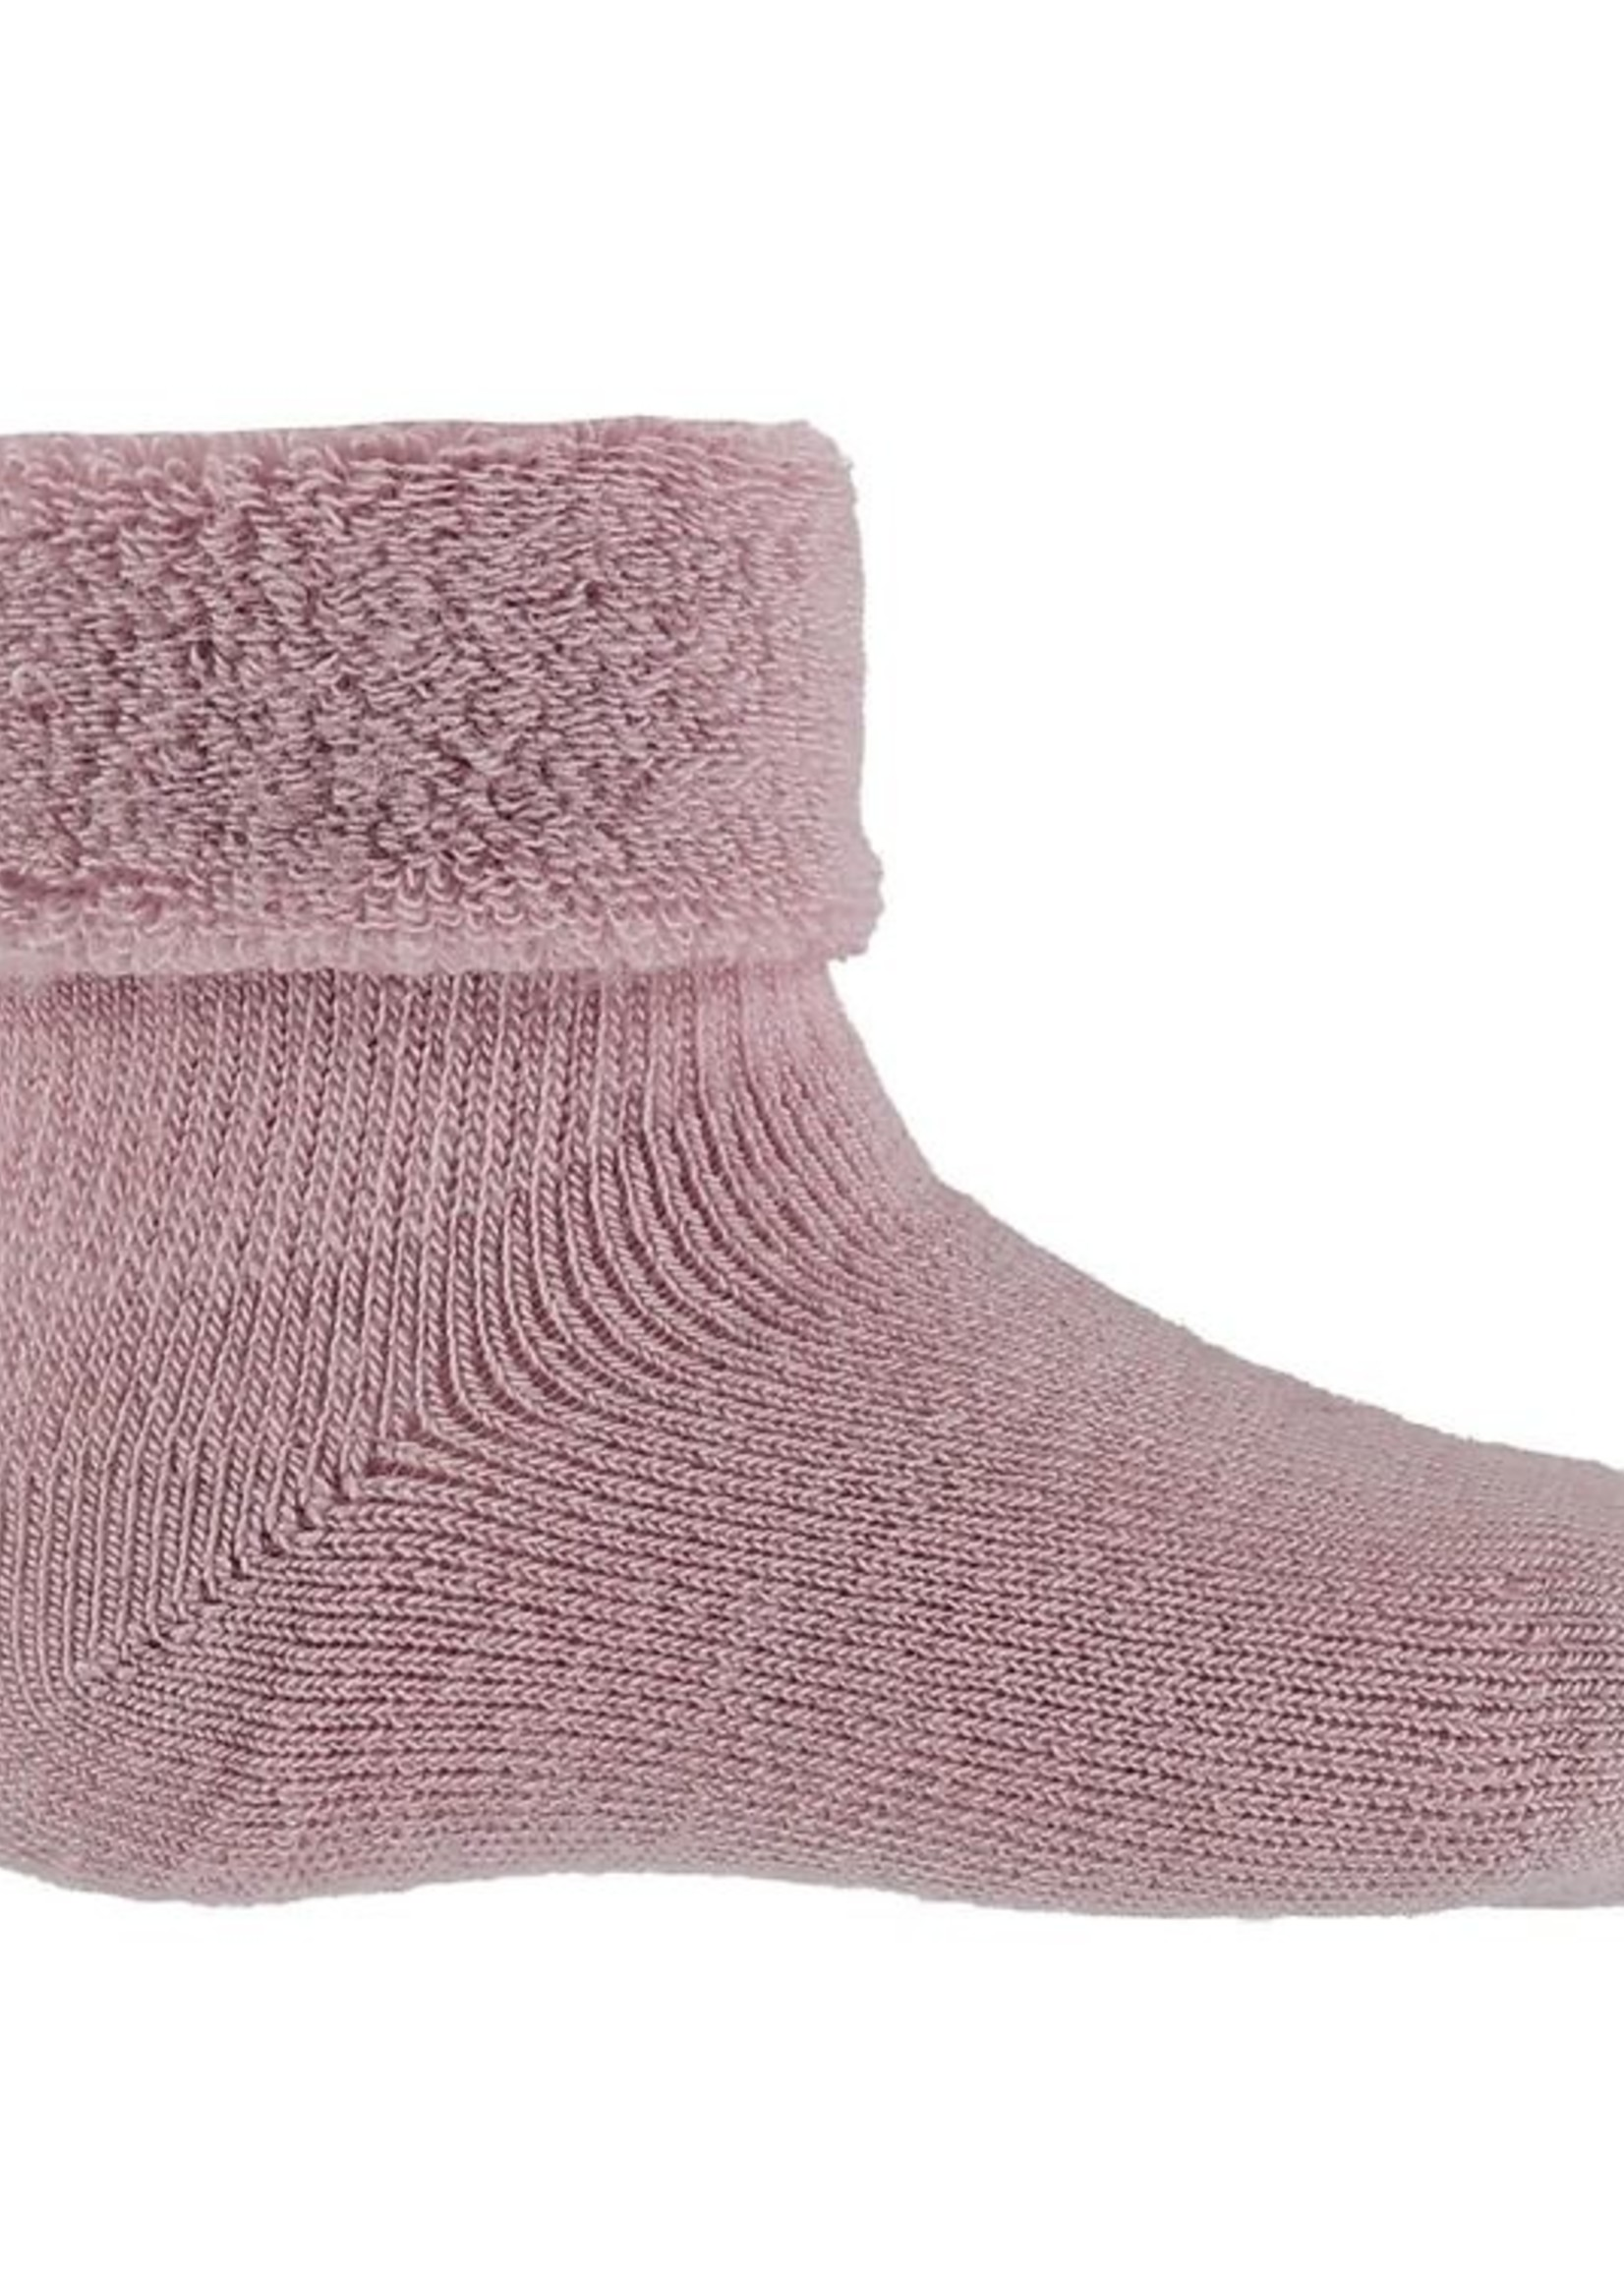 mp Denmark Terry Wool Socks - Woodrose